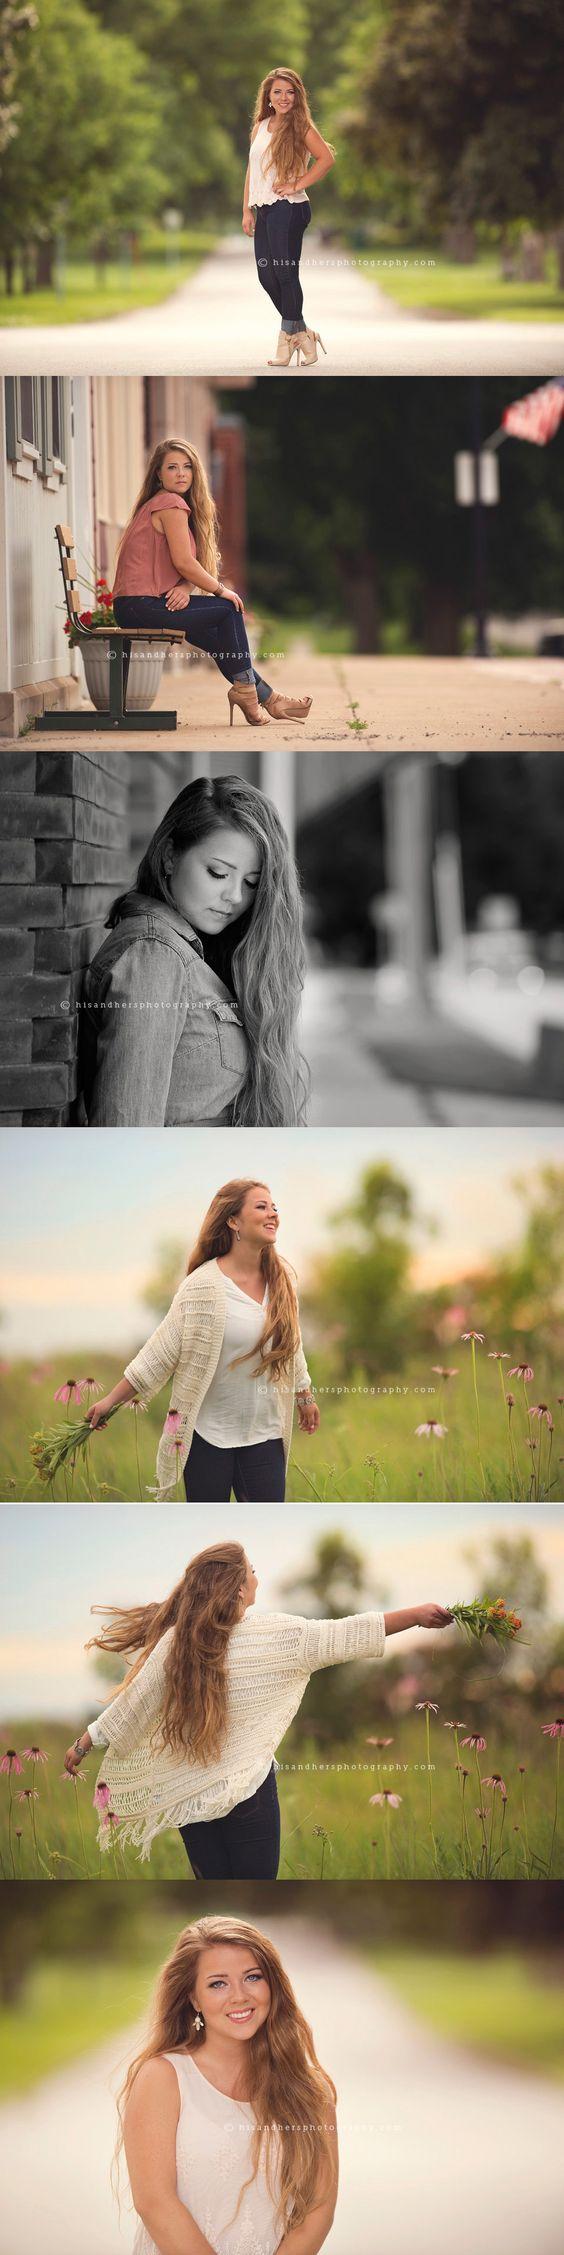 Class of 2016 senior portraits #seniorpics #classof2016 Des Moines, Iowa senior portrait photographer, Randy Milder | His & Hers